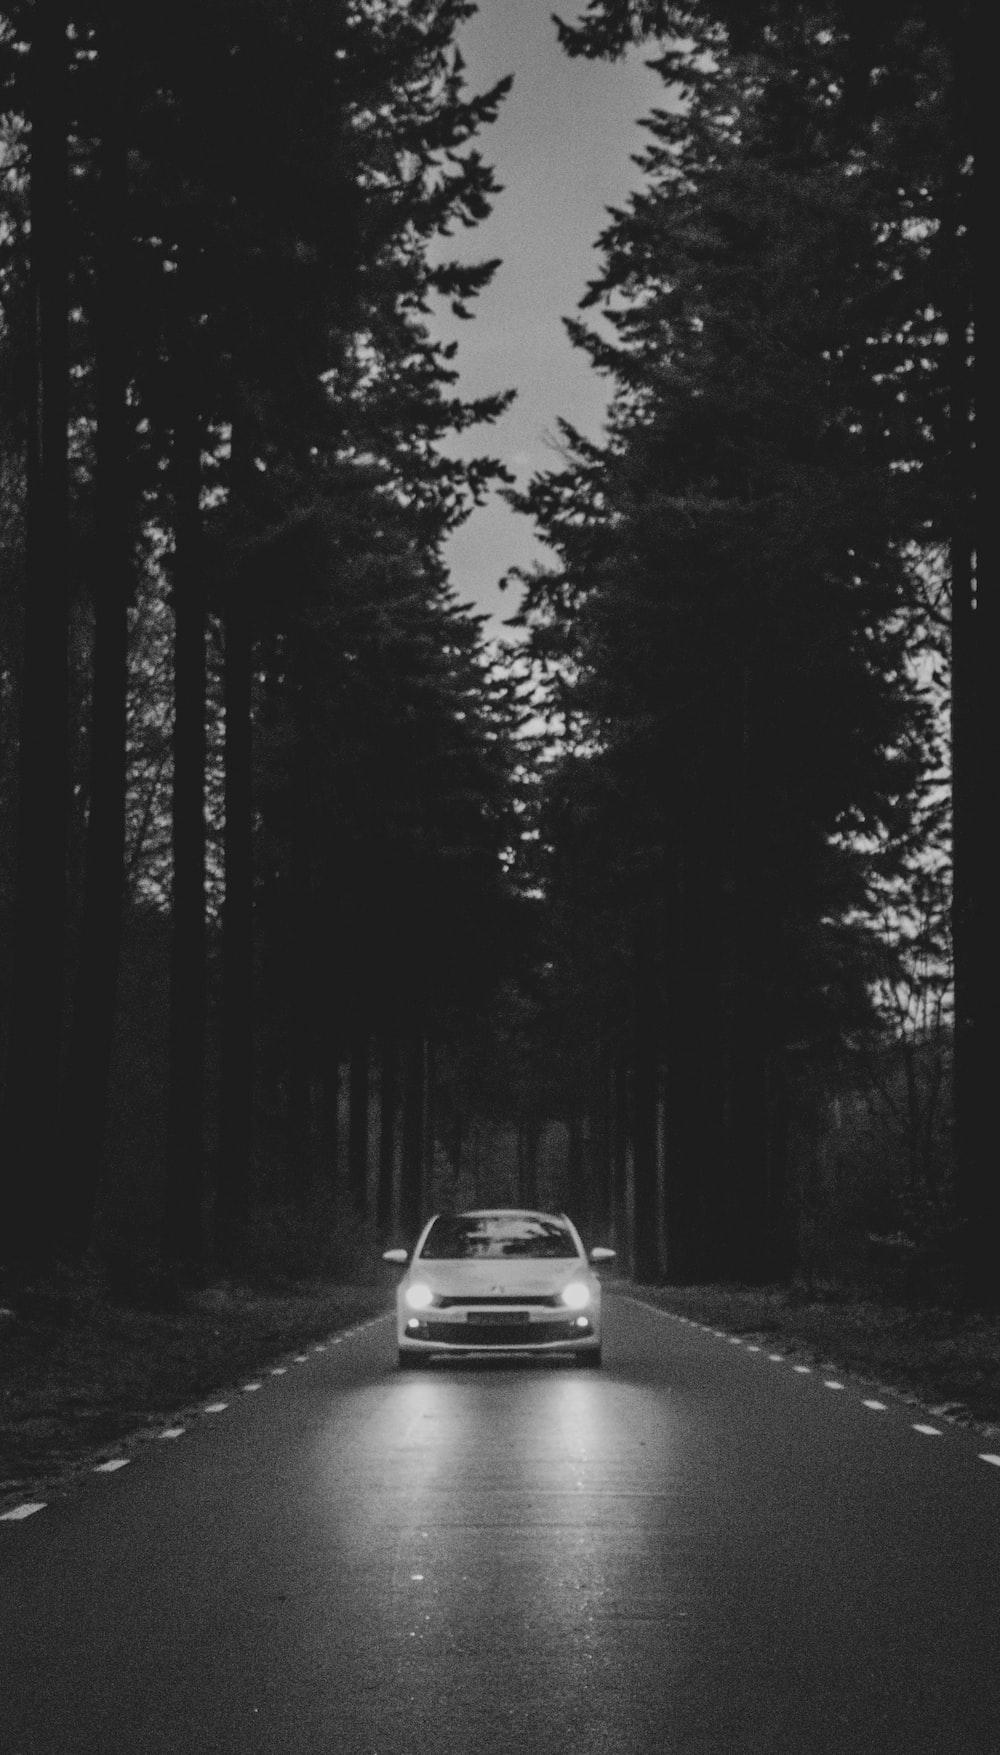 car passing through road between trees